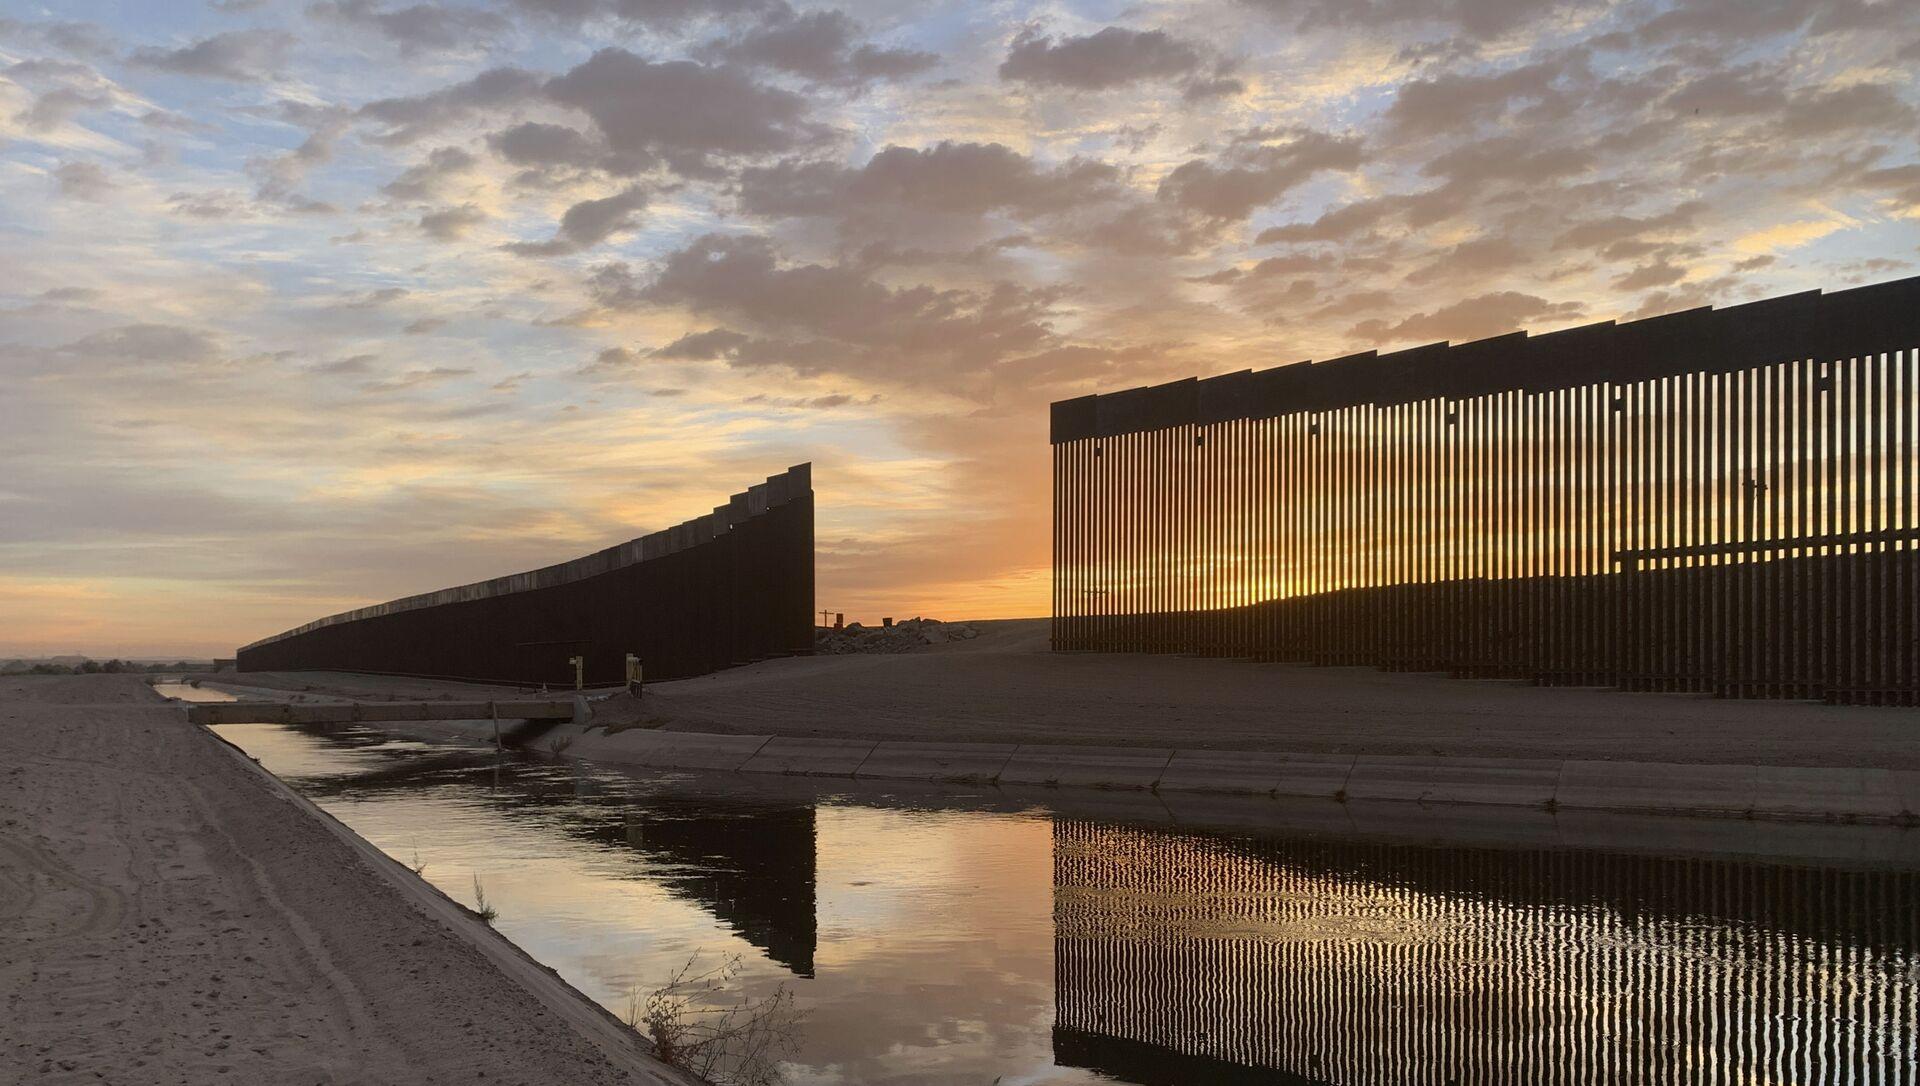 The sun sets above the U.S.-Mexico border wall, seen in Yuma, Ariz., Wednesday, June 9, 2021. - Sputnik International, 1920, 23.07.2021